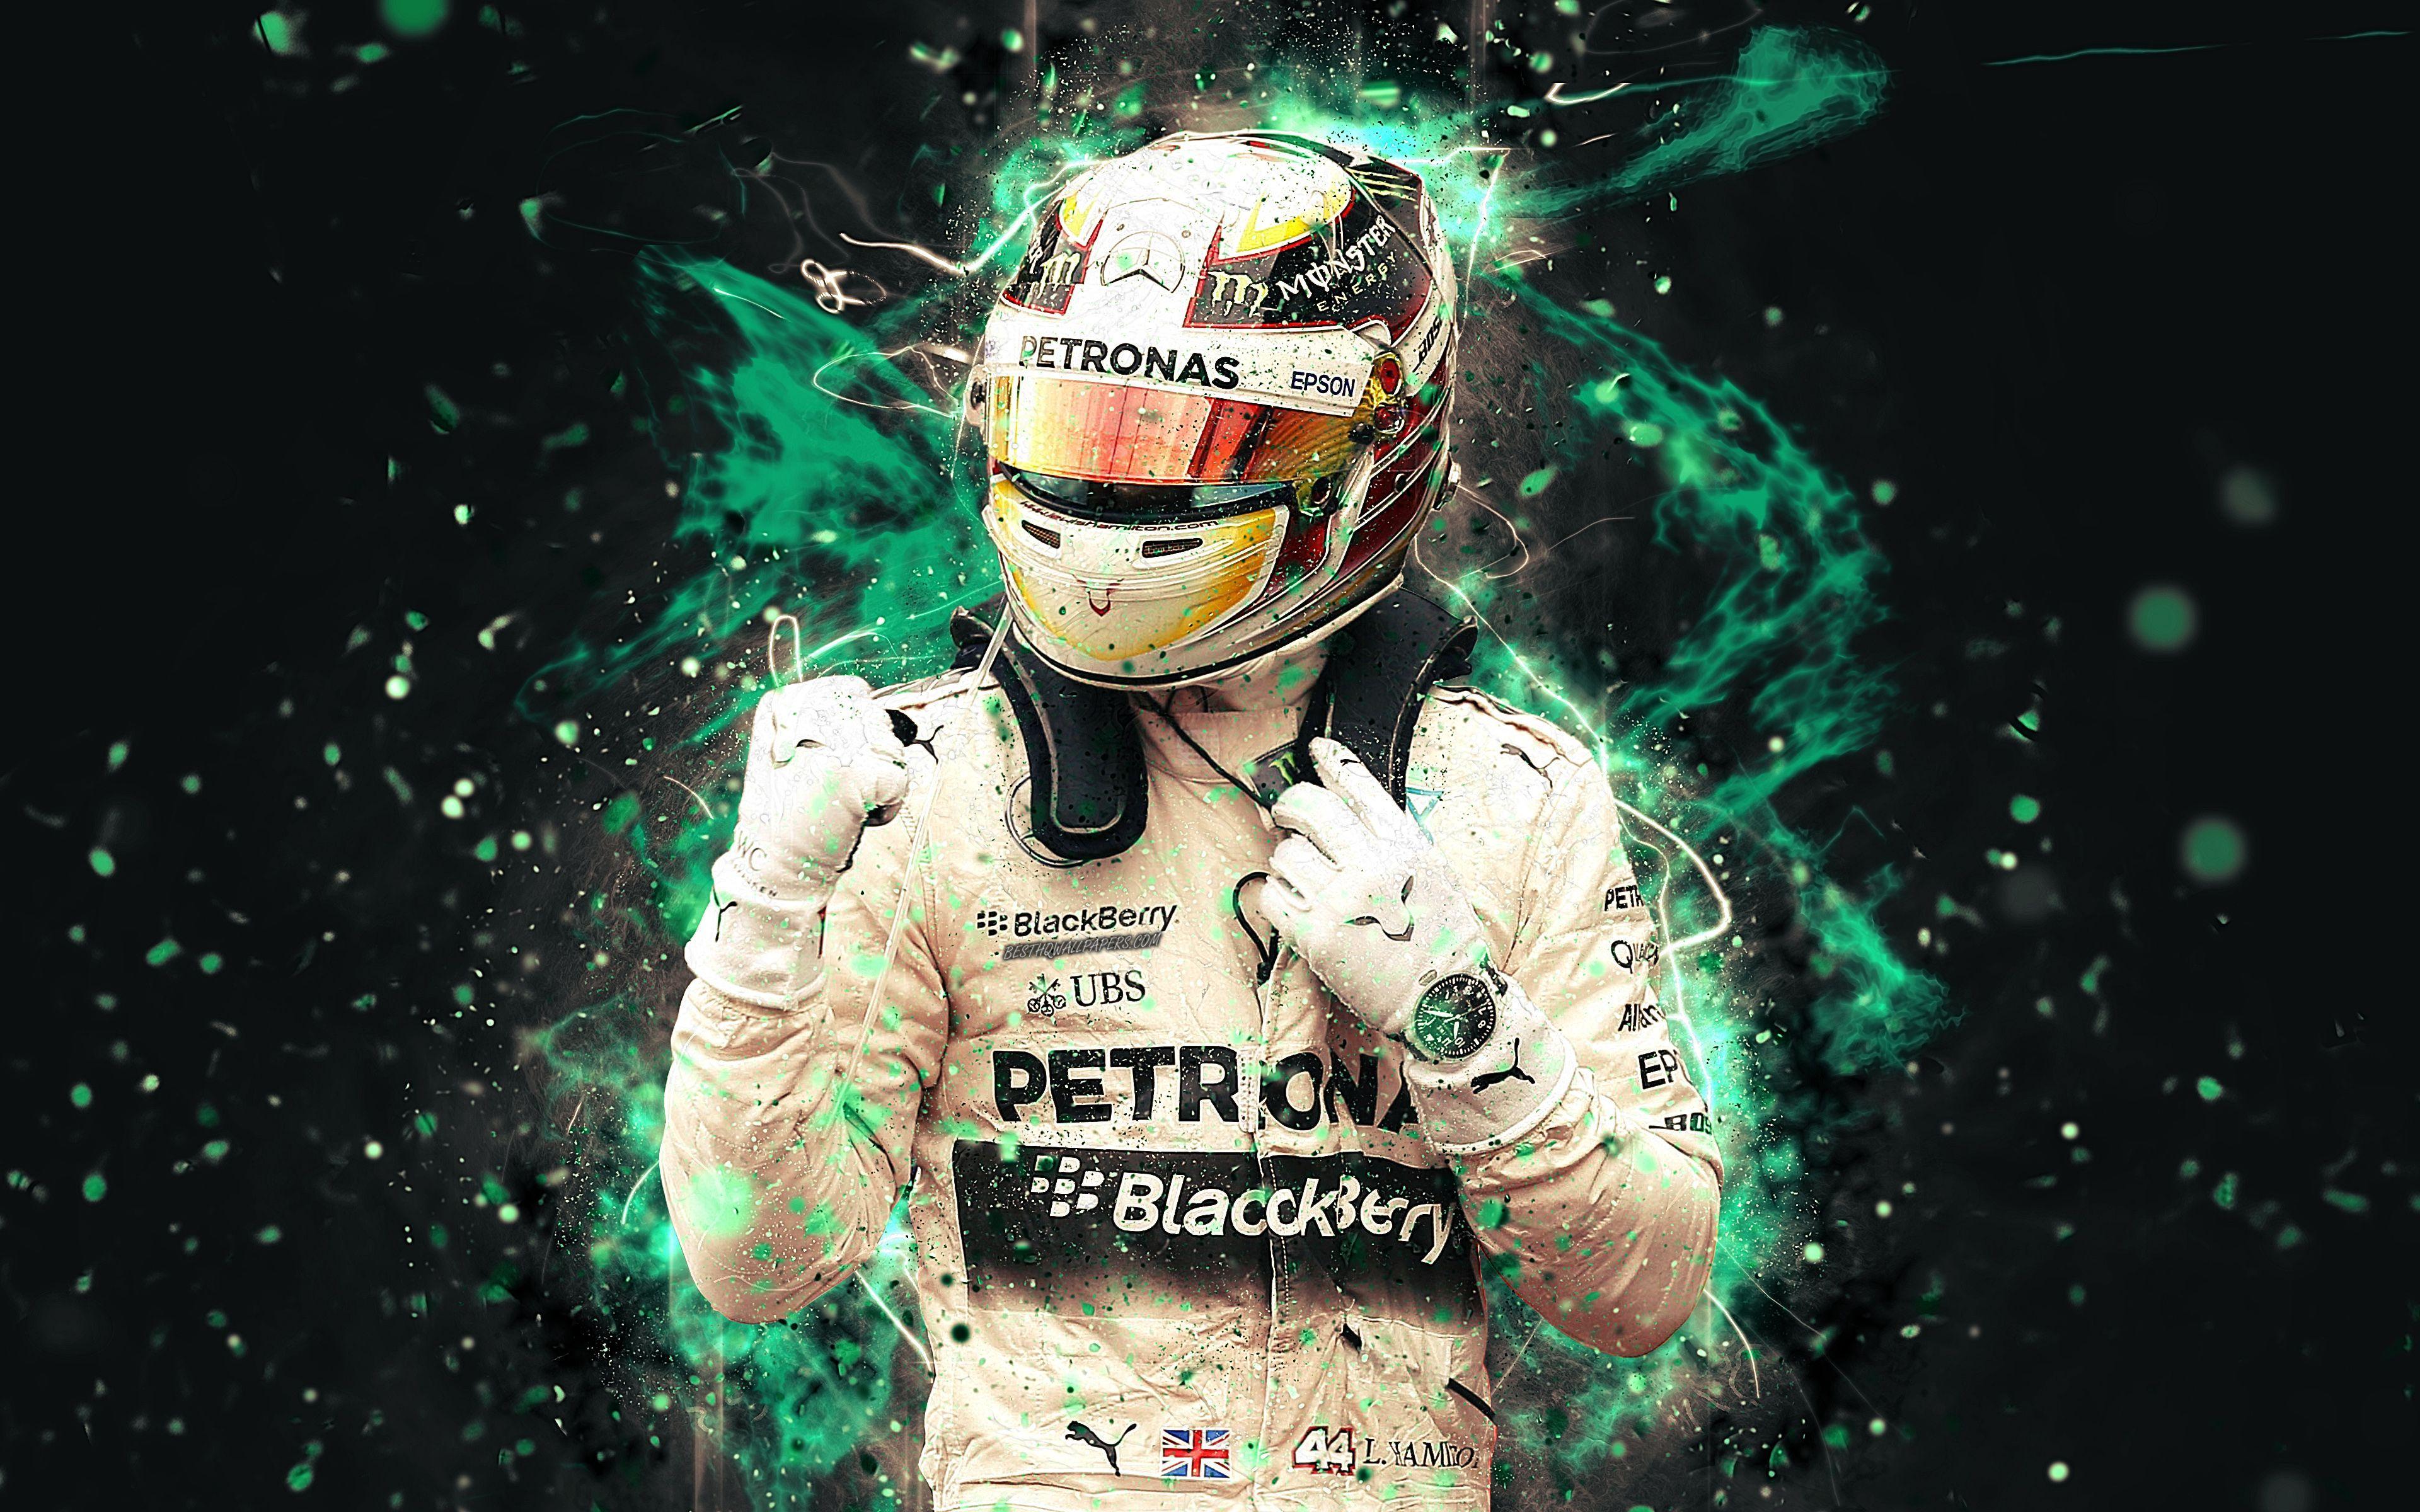 Lewis Hamilton Wallpapers Top Free Lewis Hamilton Backgrounds Wallpaperaccess